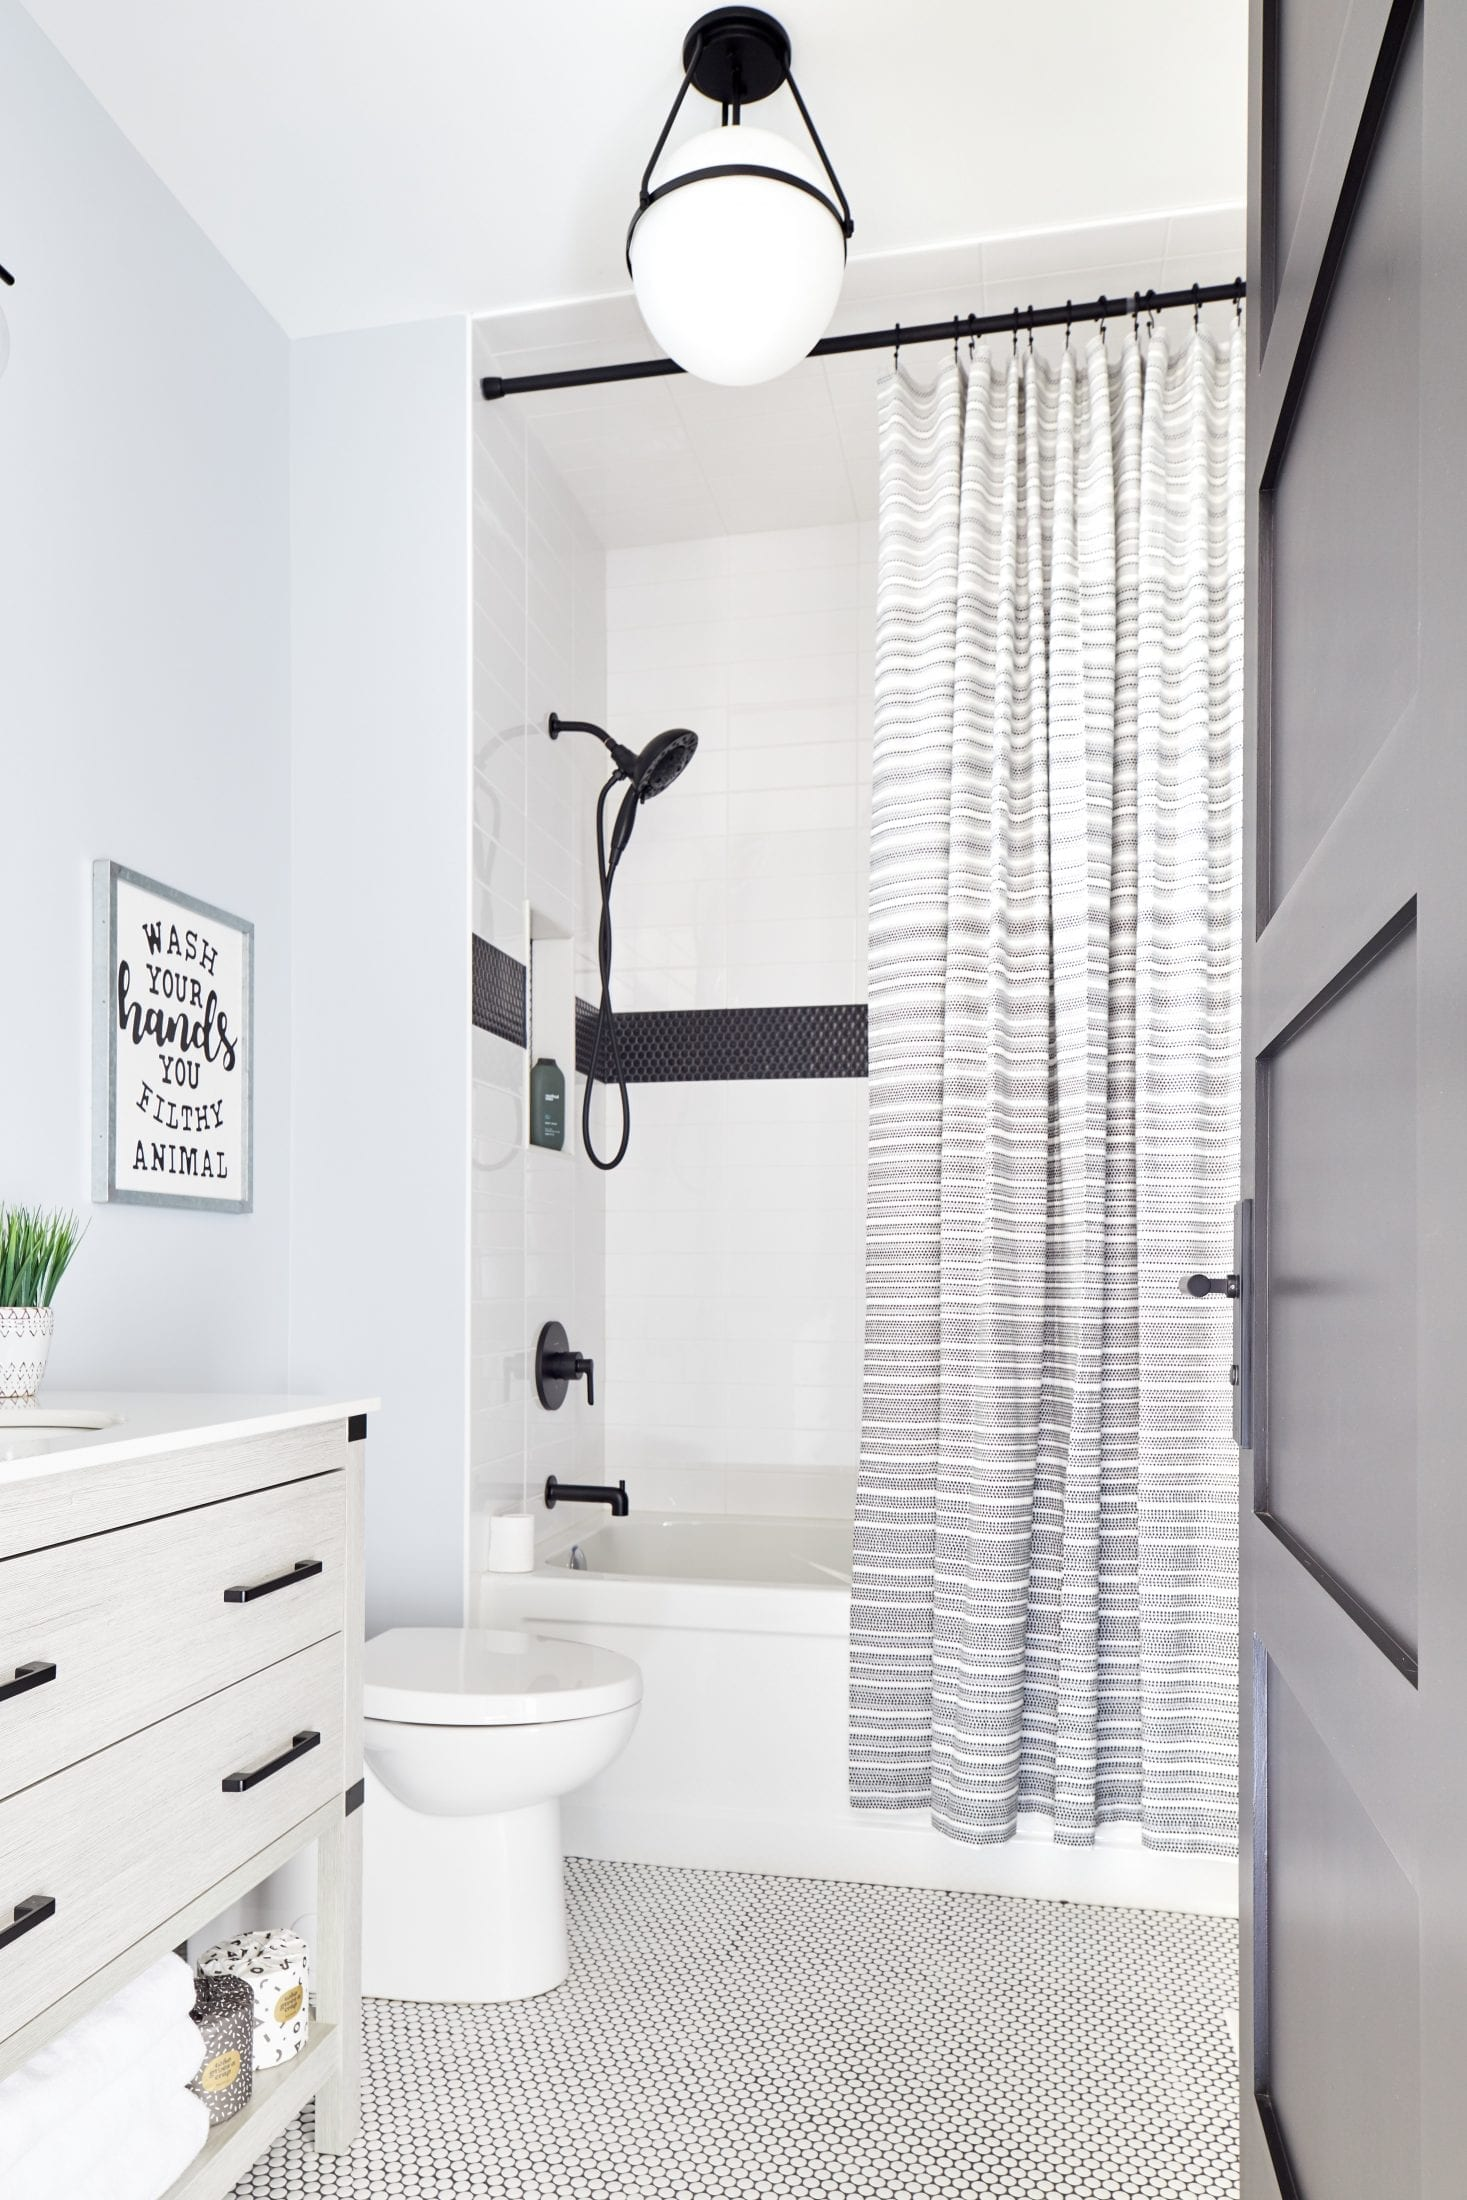 Teen boys bathroom design white and black penny tile